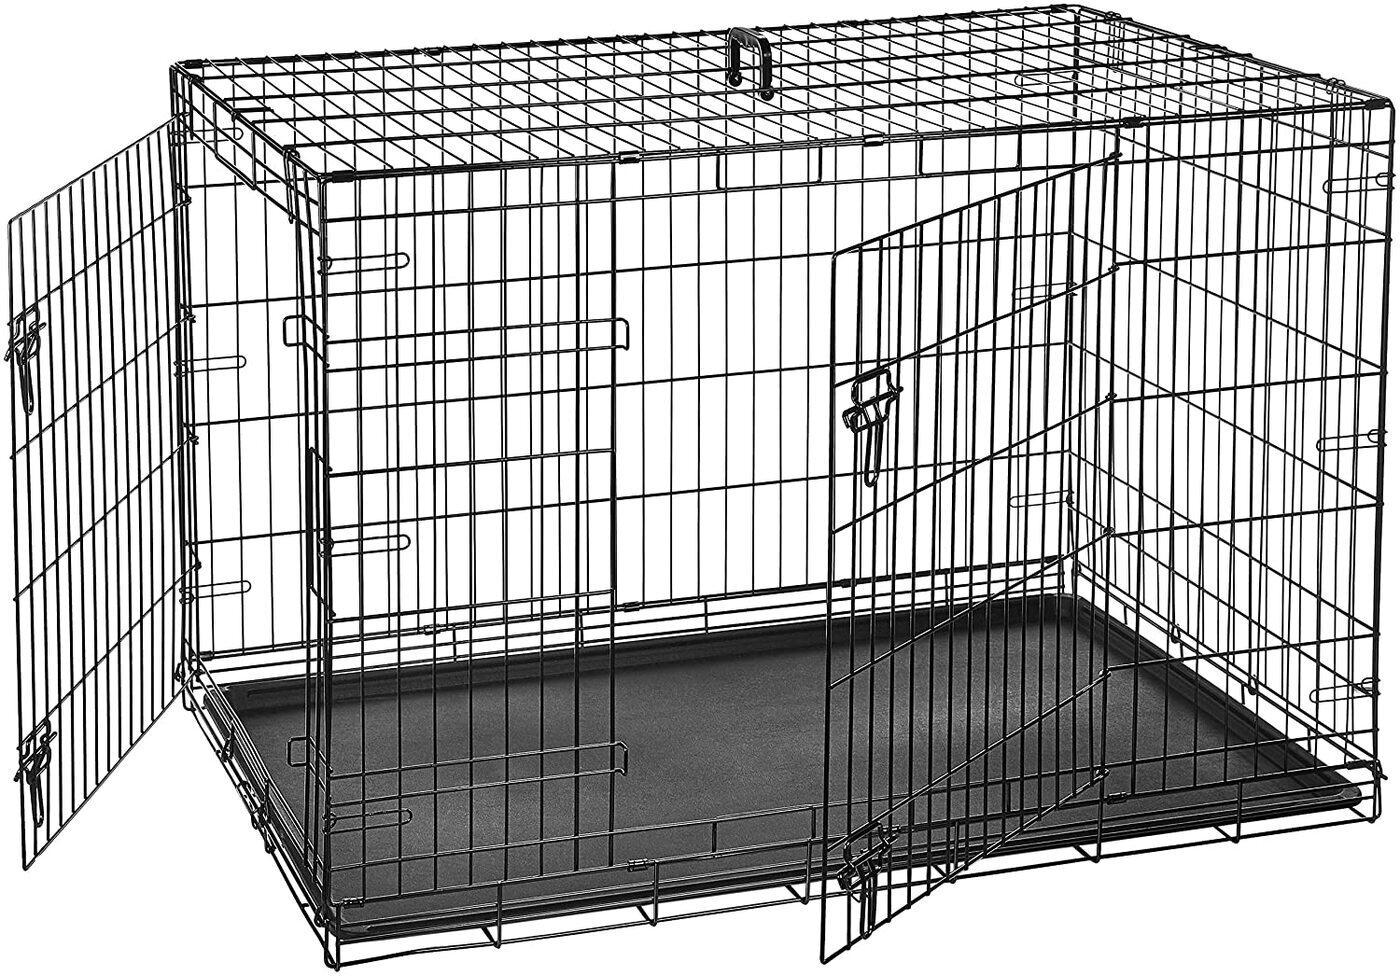 Papillon ВИА Клетка металлическая с 2 дверками, 61*54*58 см (Wire cage 2 doors) 150261, 11,500 кг, 15243